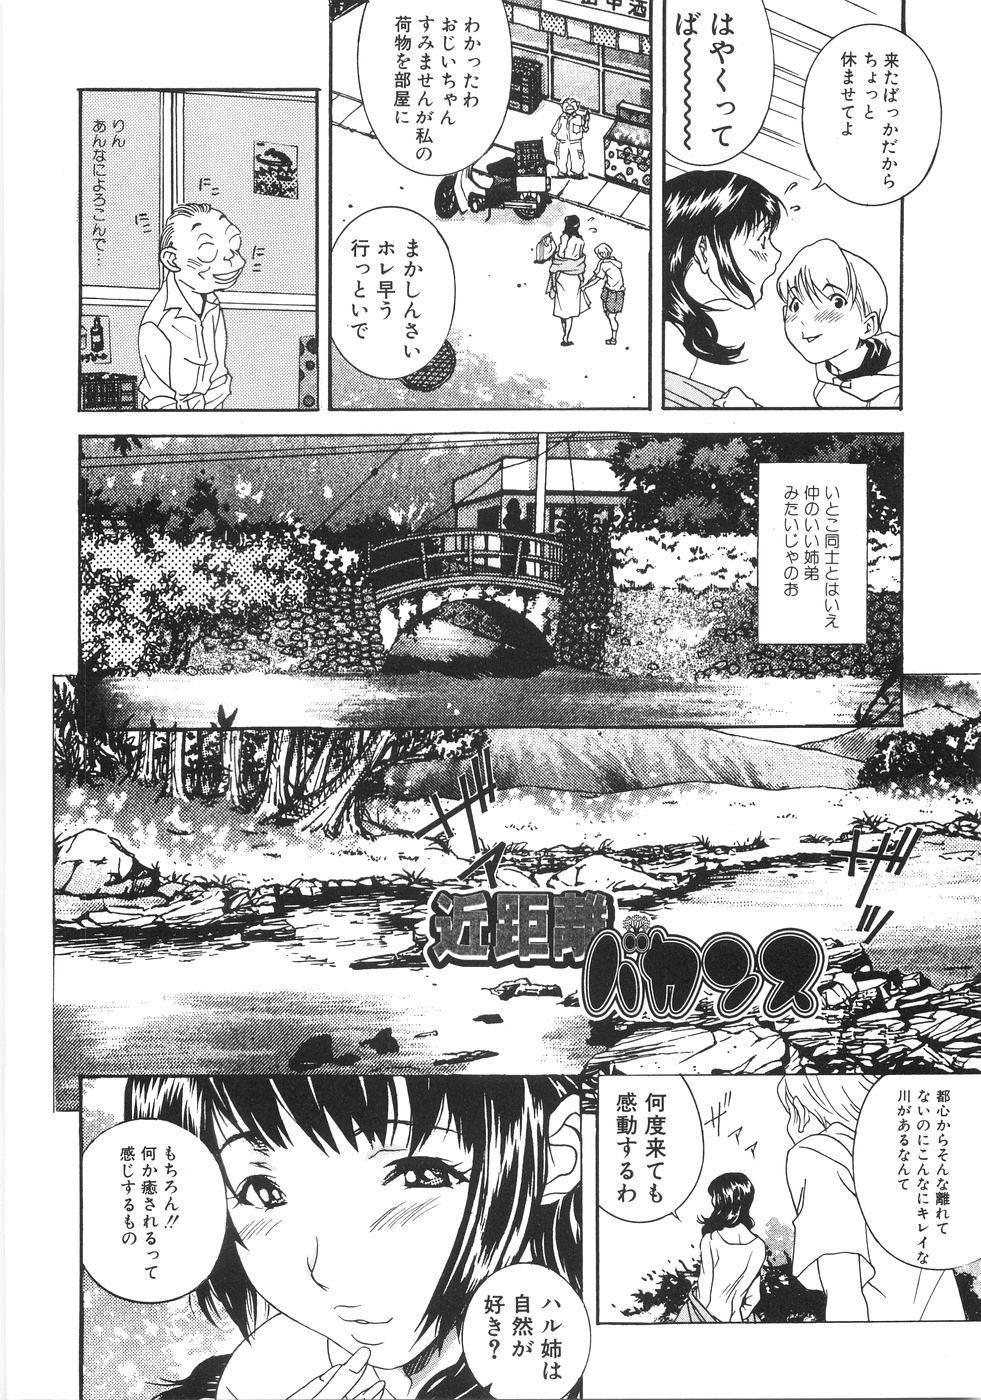 Honki Jiru - Cowper's Gland Liquid? or Love Juice?...?! 82